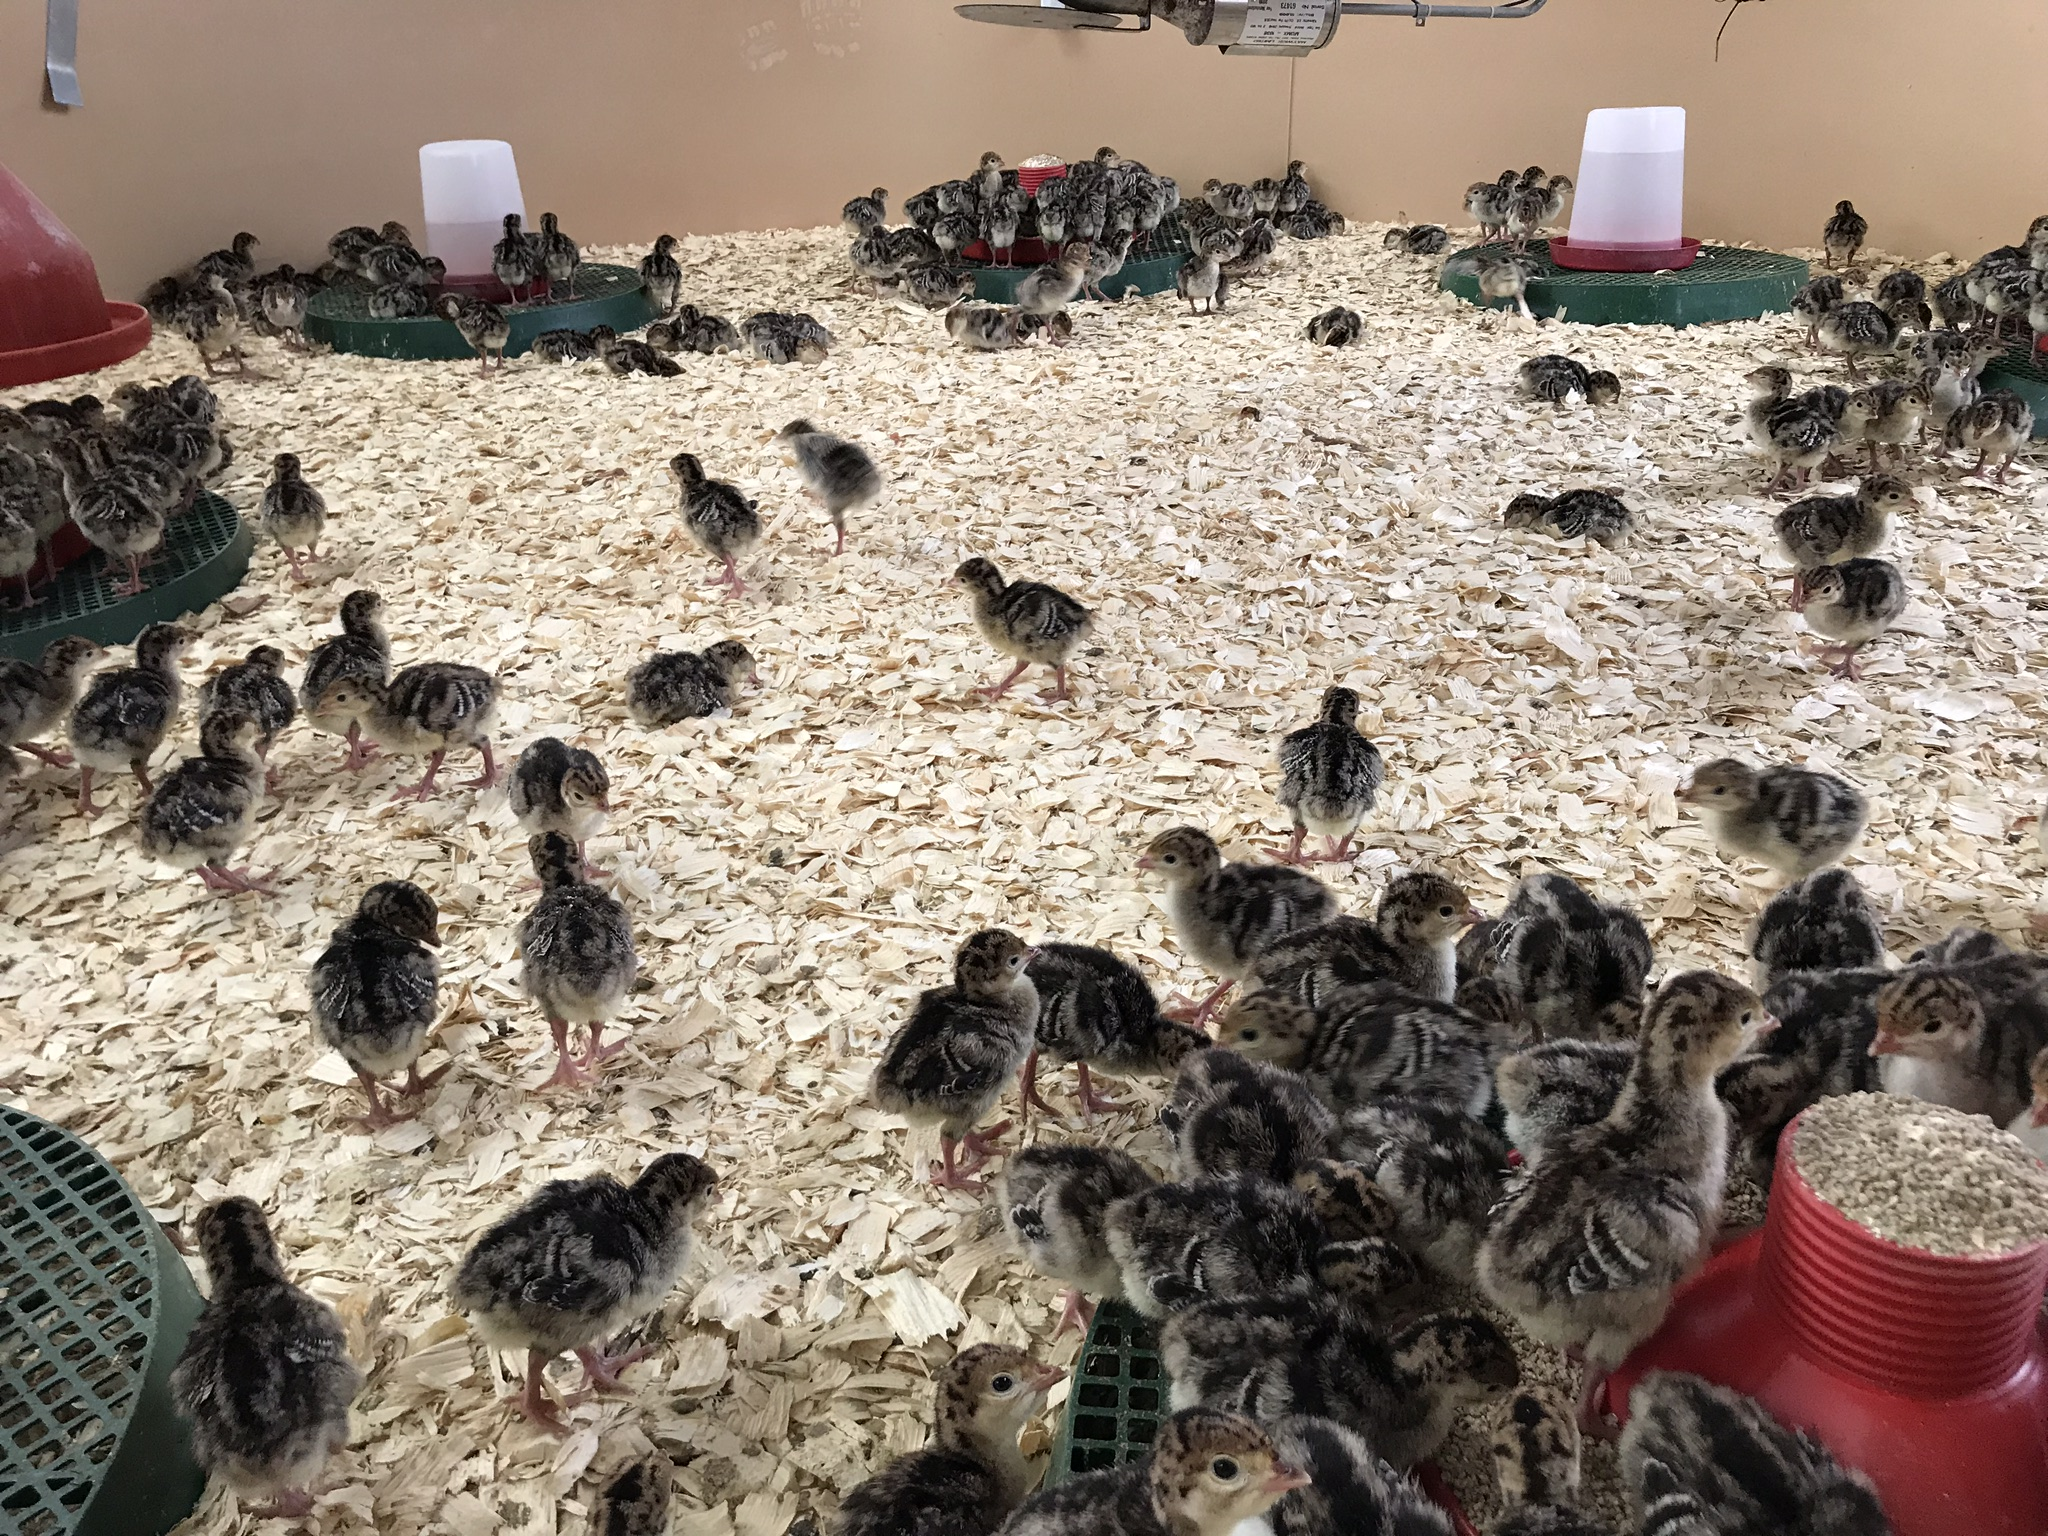 Bramble-farm-bronze-free-range-turkey-chicks-week1